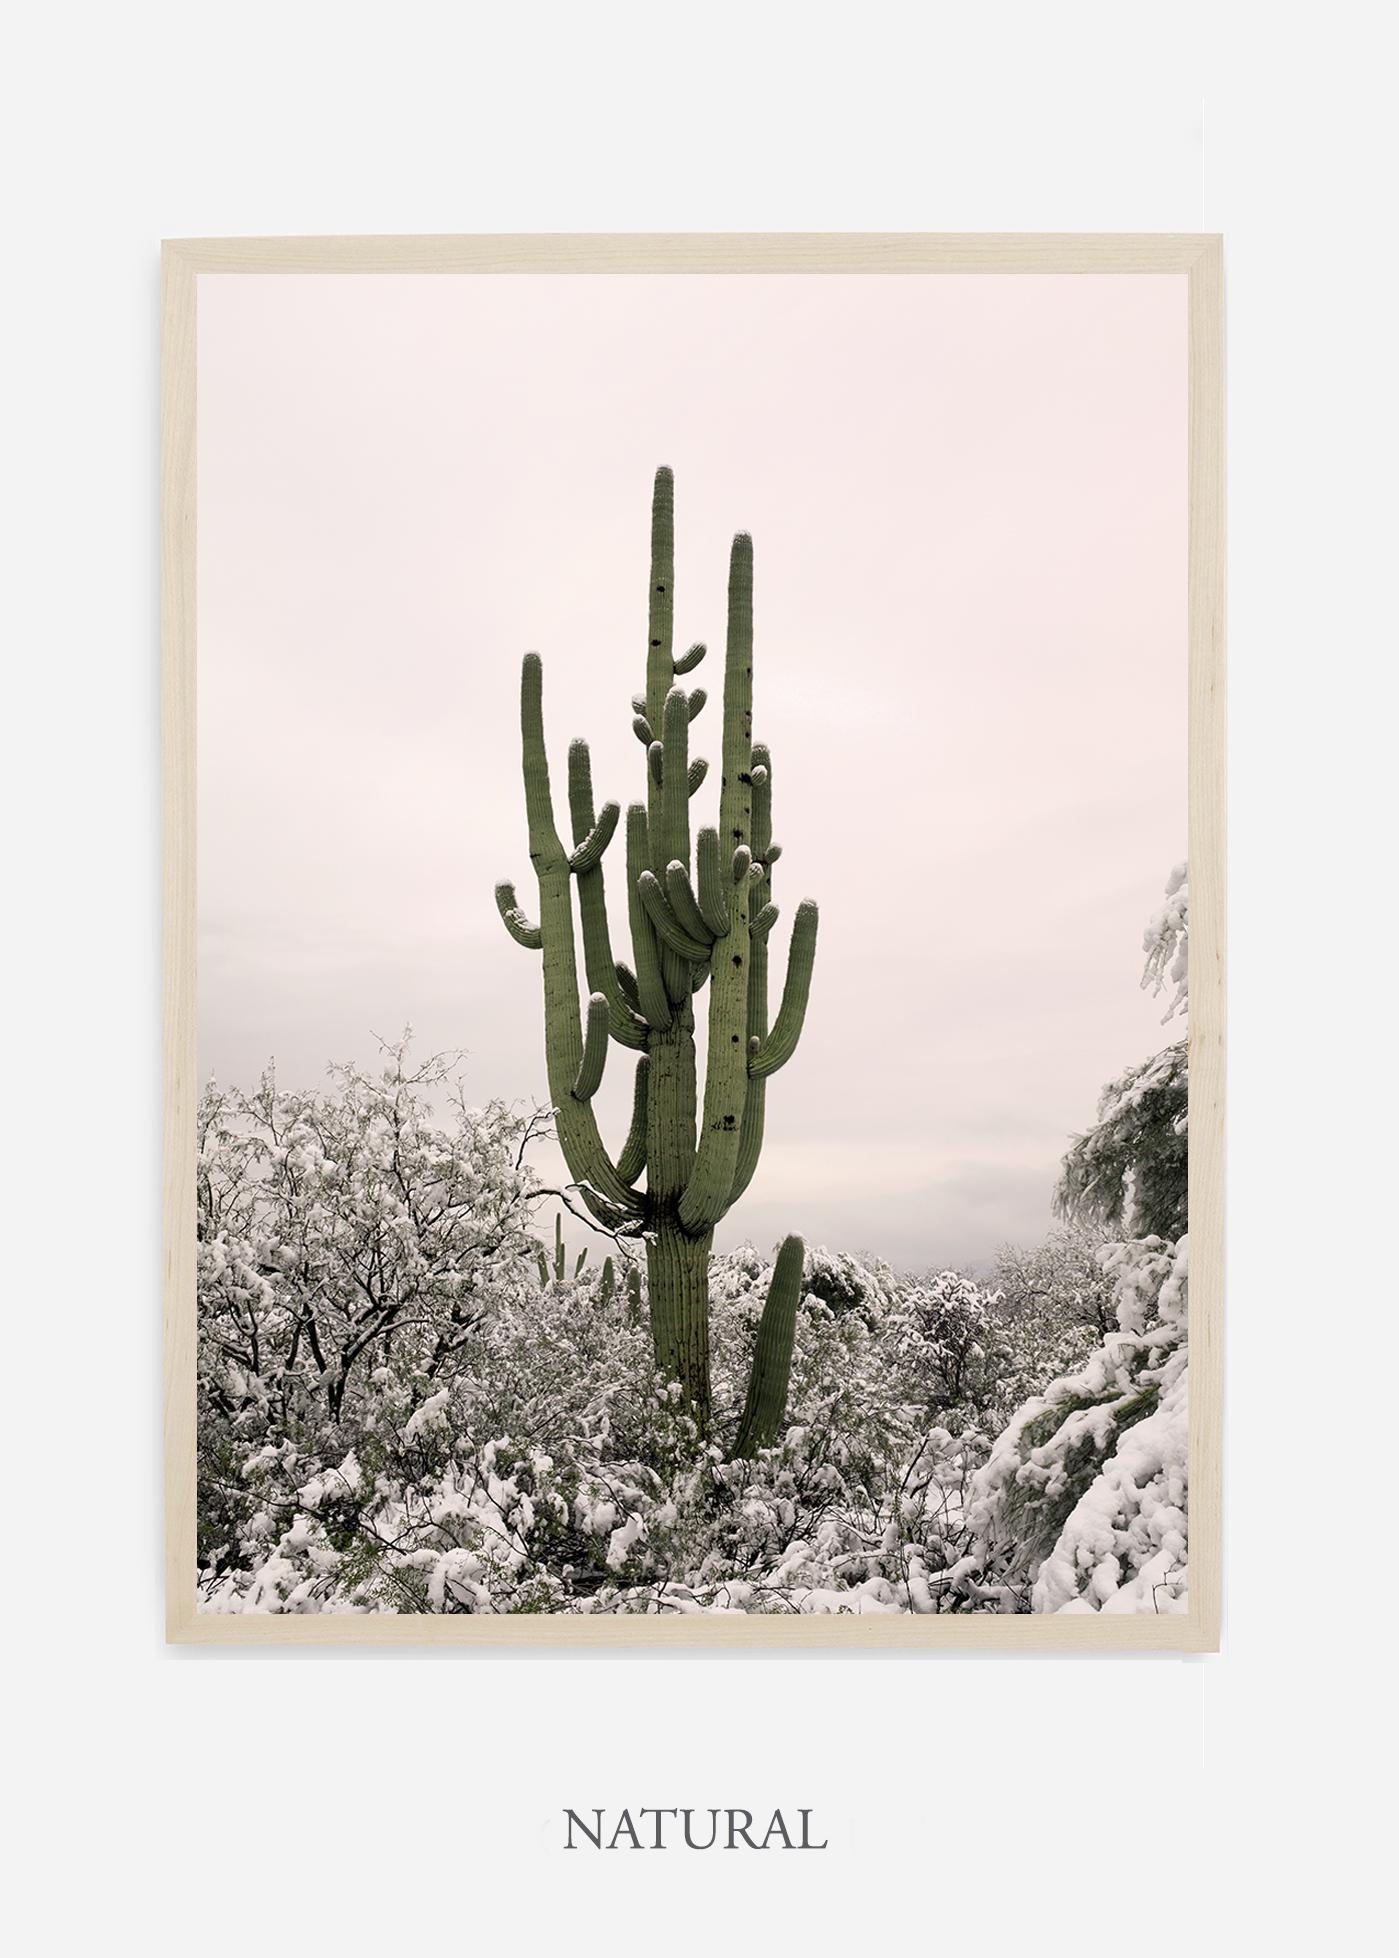 nomat-naturalframe-saguaroNo.8-wildercalifornia-art-wallart-cactusprint-homedecor-prints-arizona-botanical-artwork-interiordesign.jpg